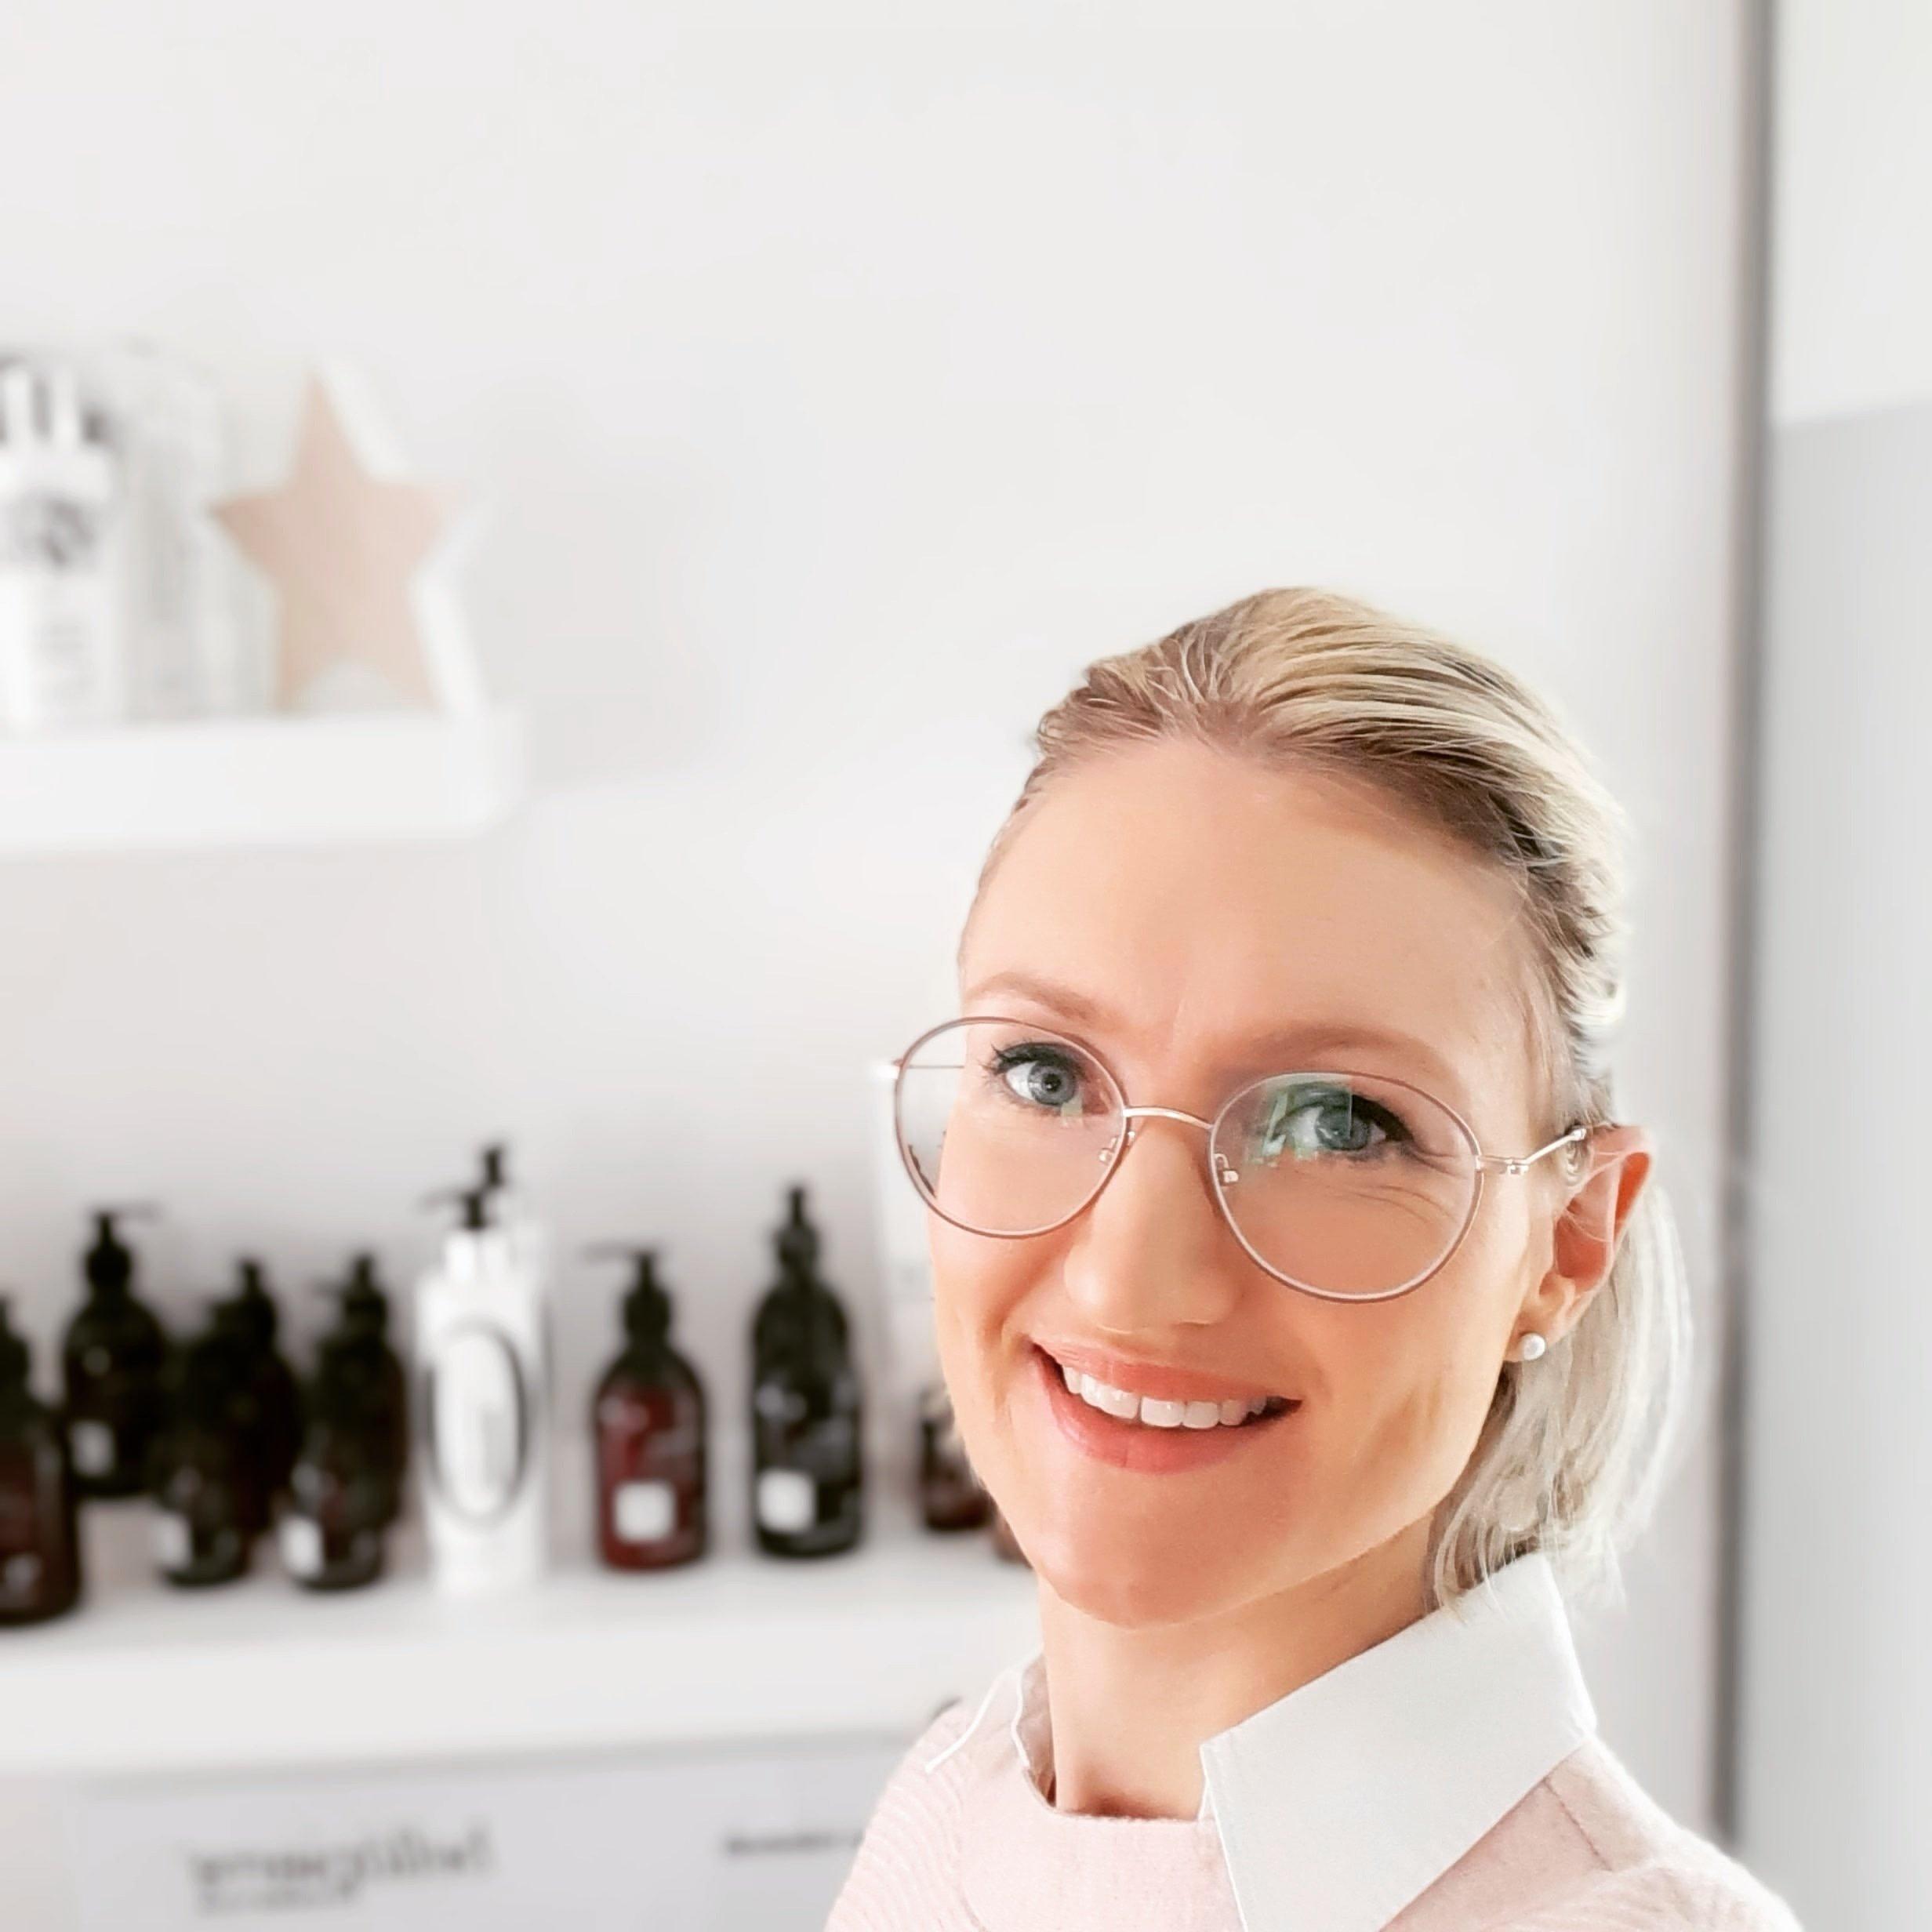 Schoonheidsspecialiste Appelterre/Ninove draagt bril en roze trui met witte blouse